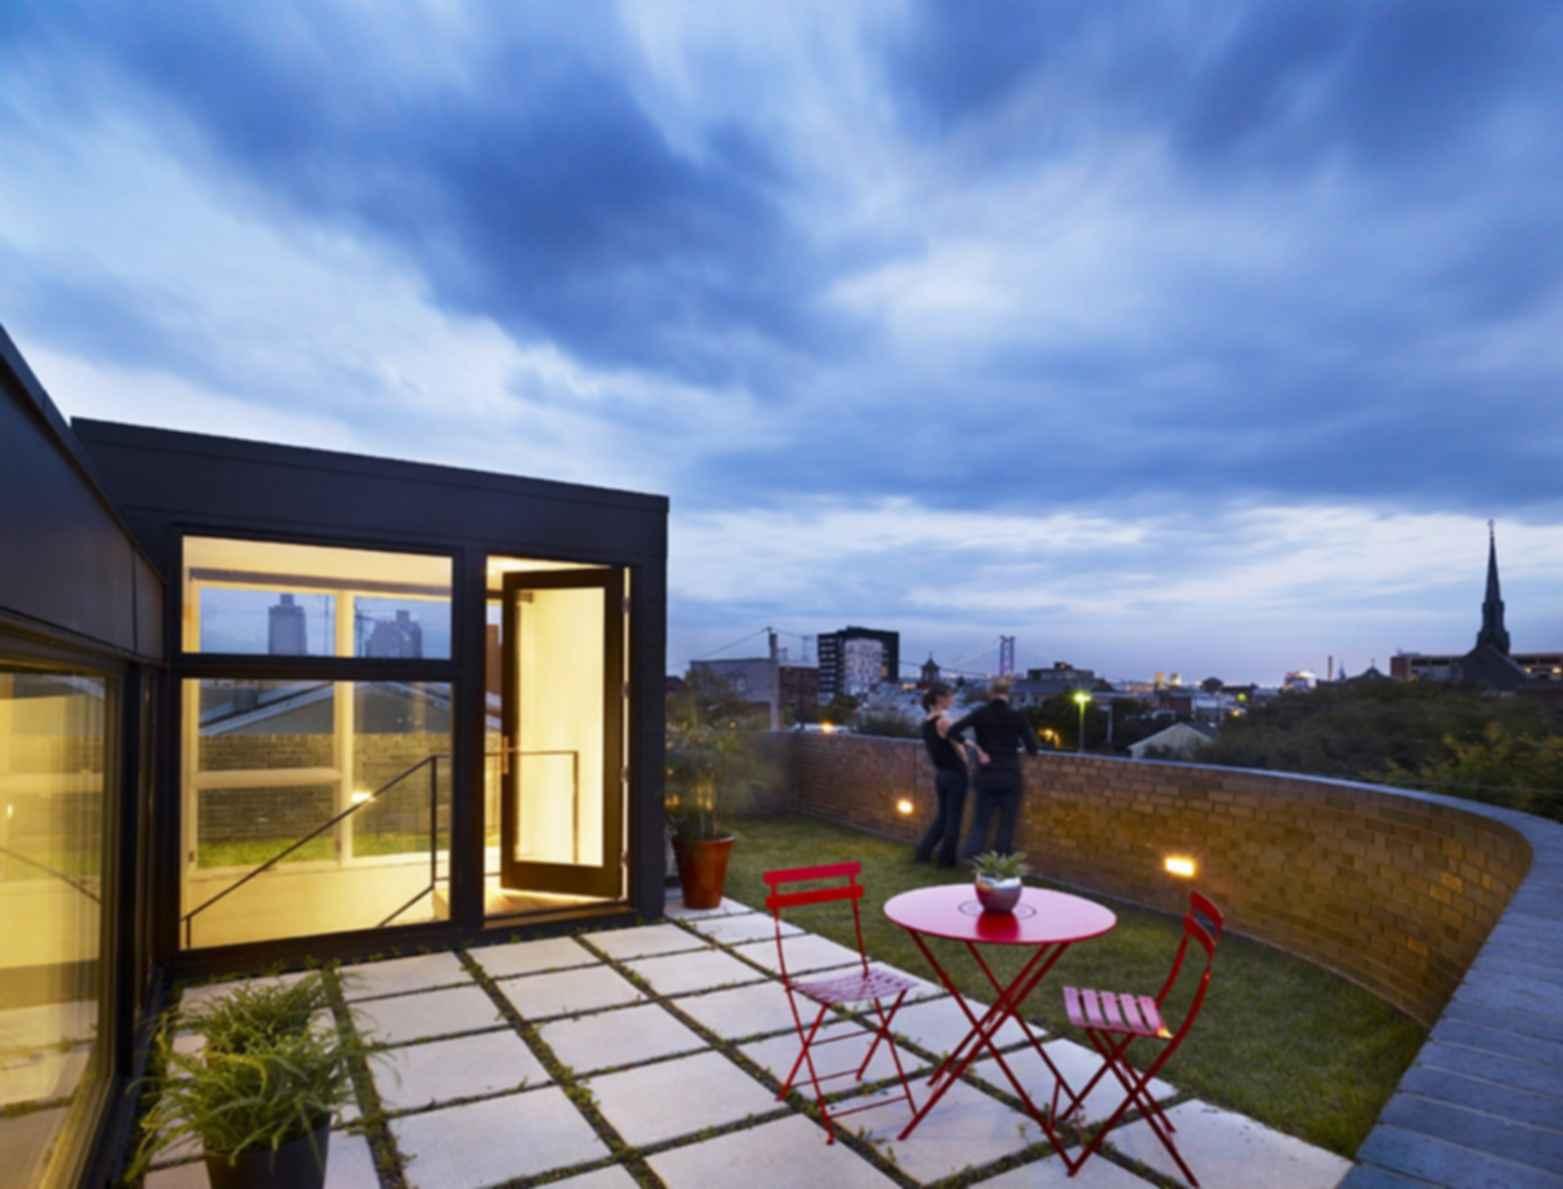 Split Level House - Exterior/Outdoor Area